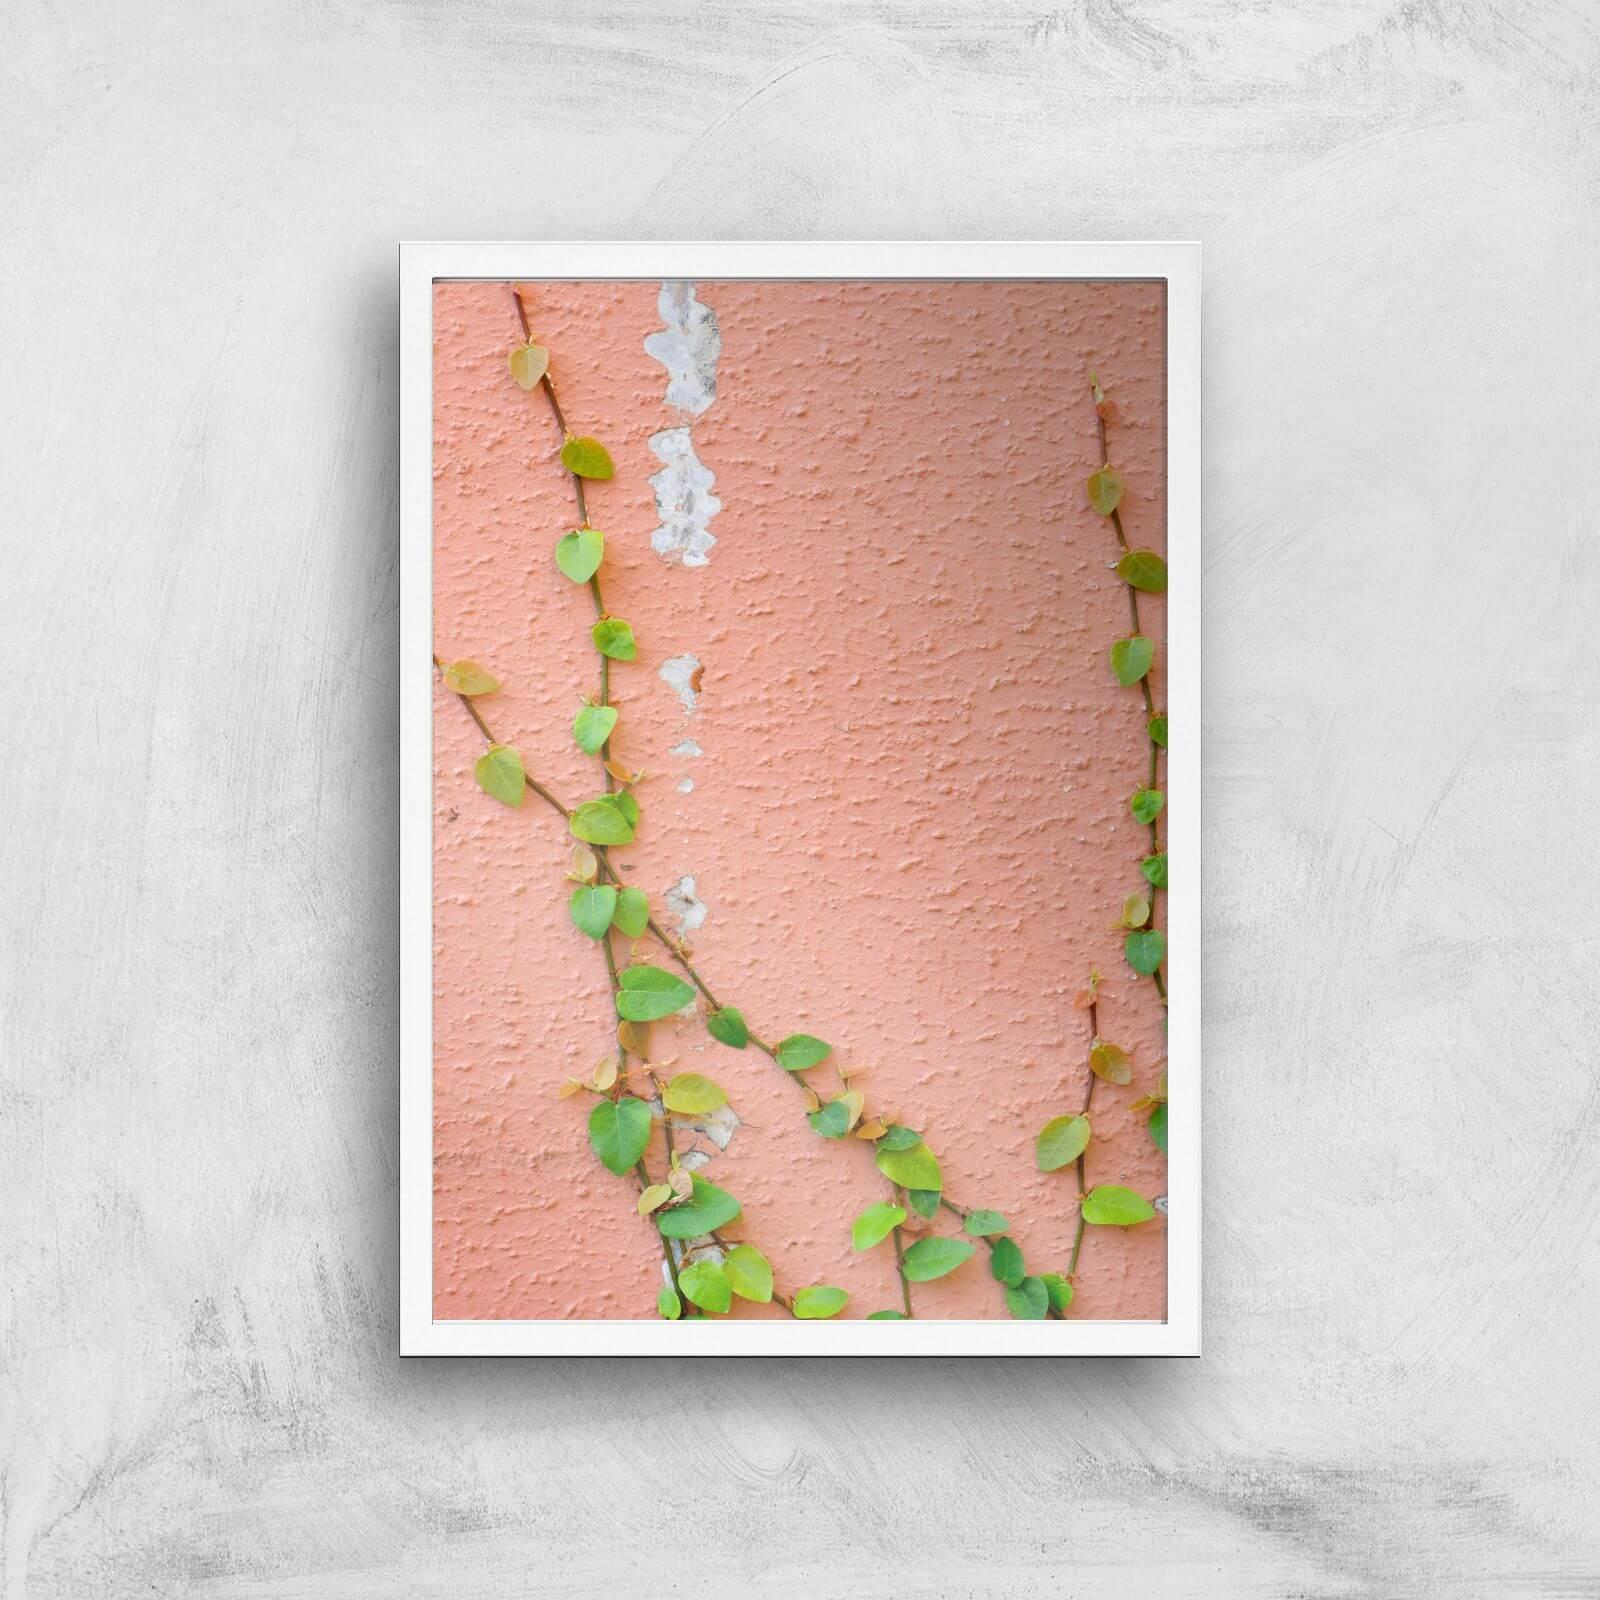 Climbing Ivy Giclee Art Print   A4   White Frame